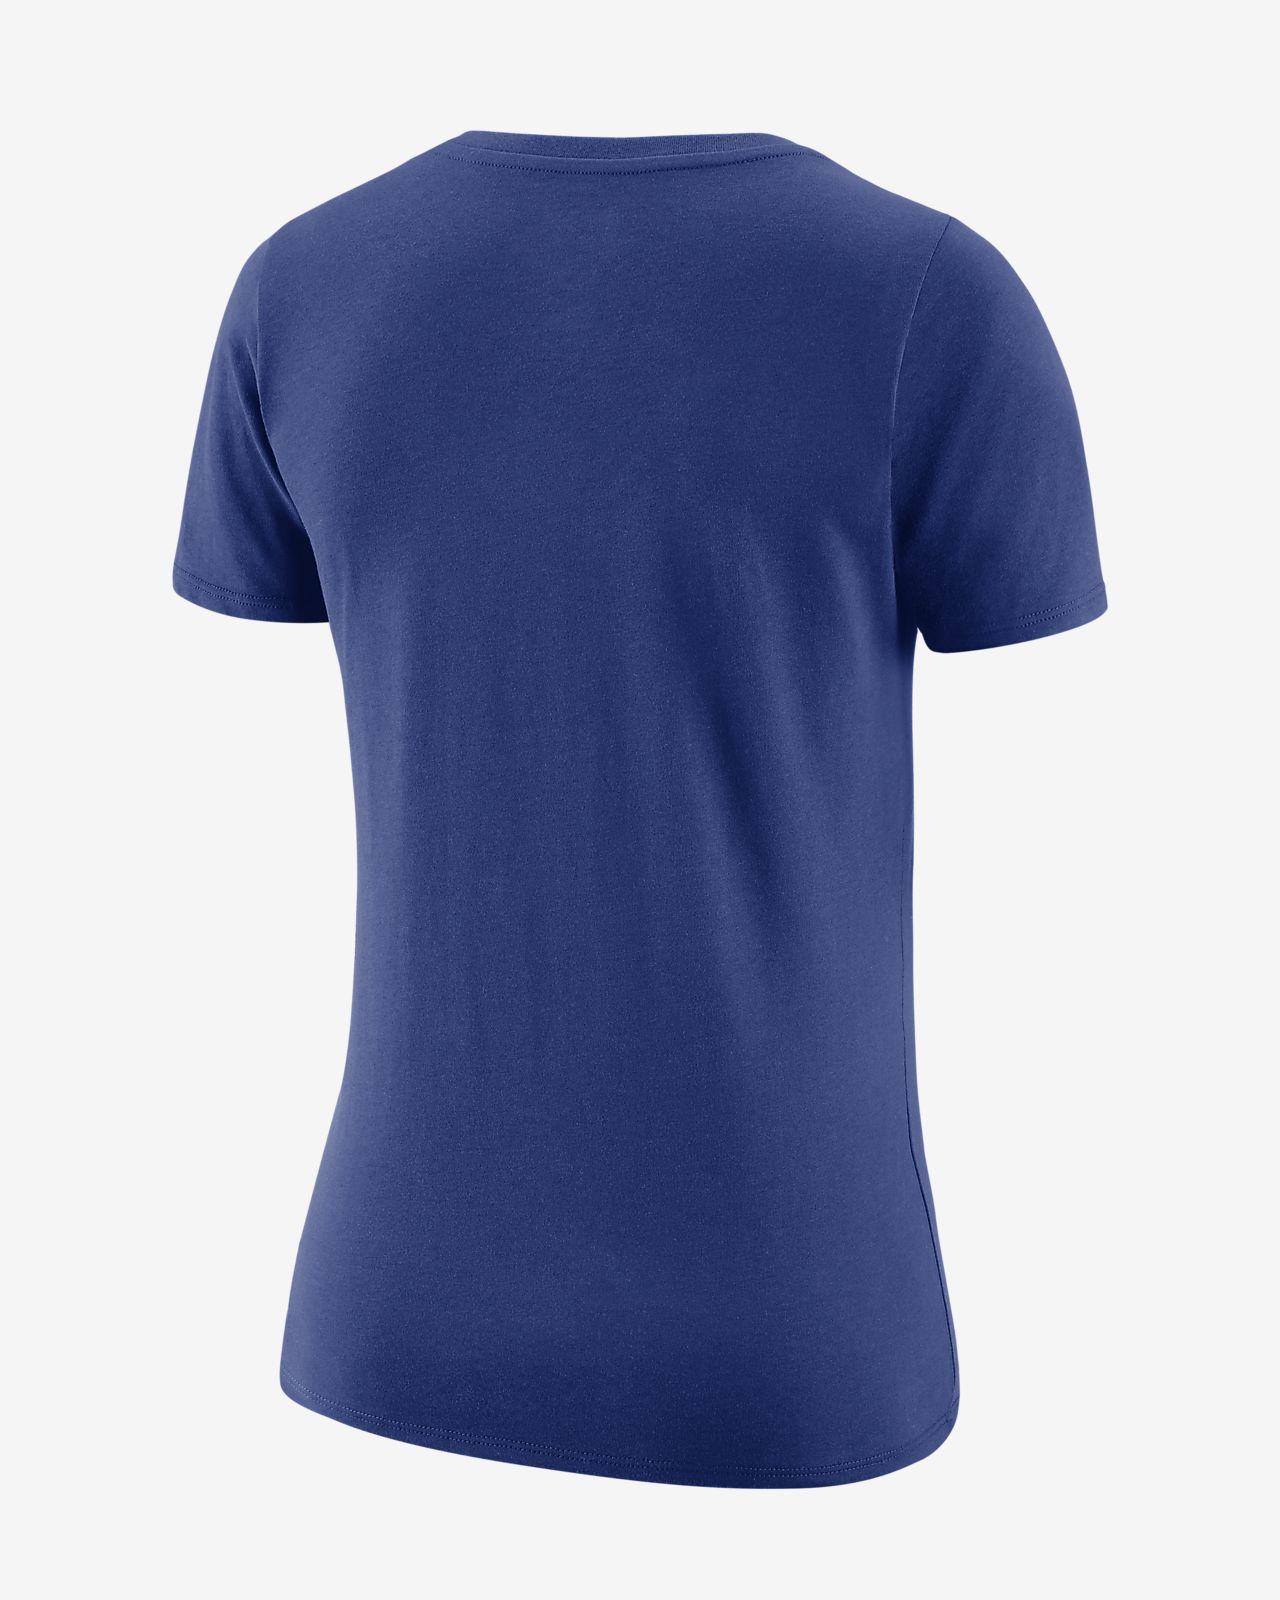 642a0723 New York Knicks Nike Dri-FIT Women's NBA T-Shirt. Nike.com